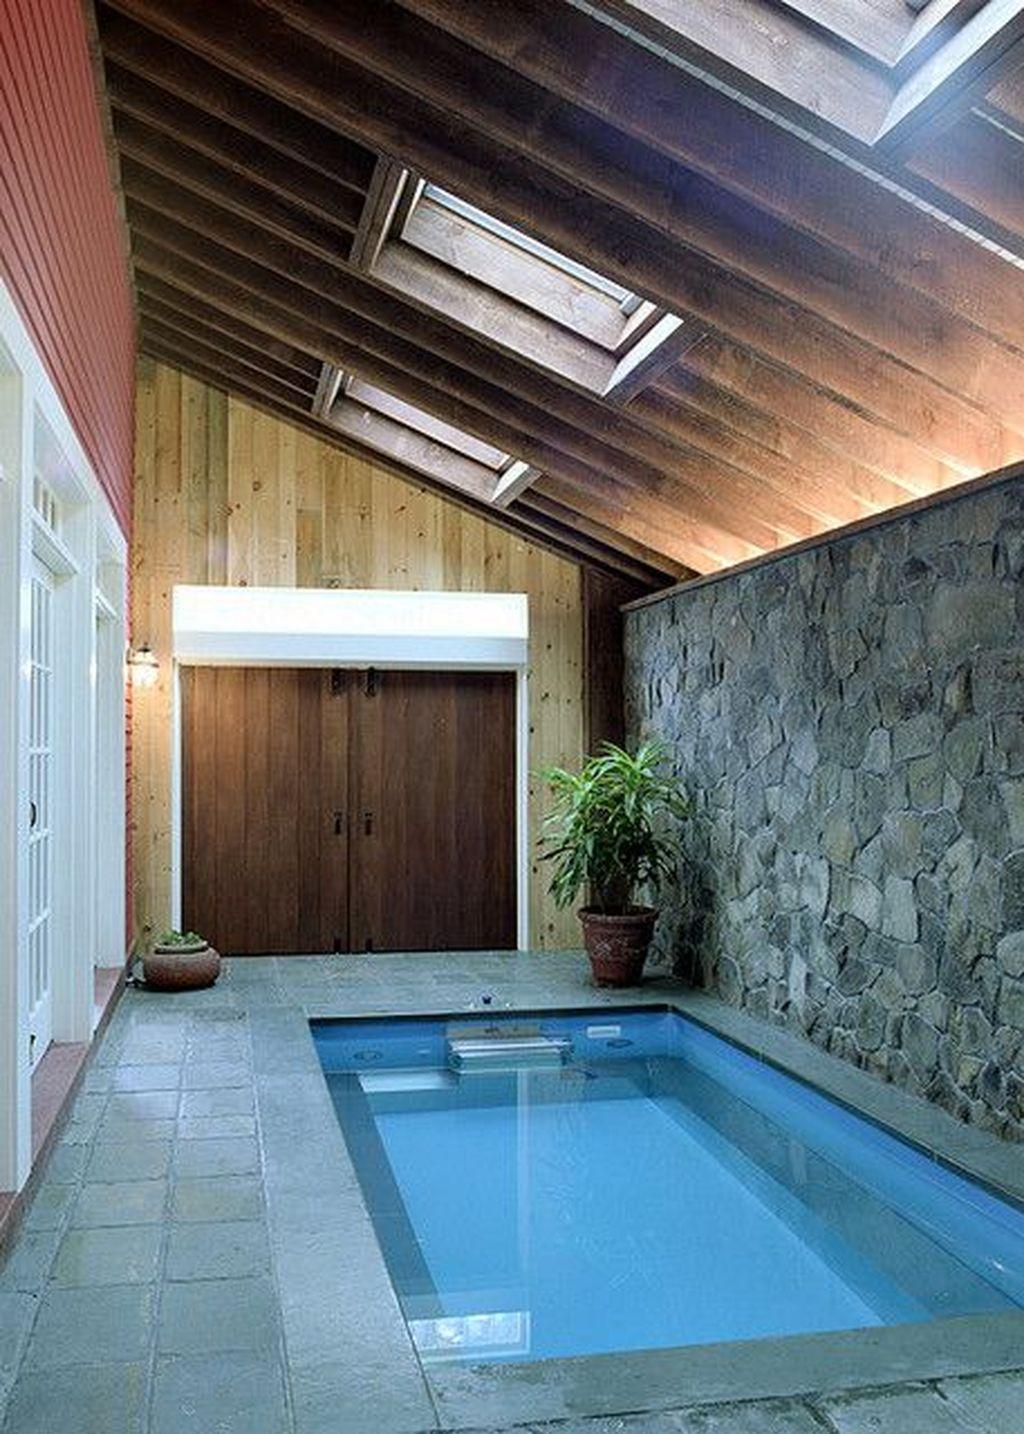 Nice 36 Amazing Small Indoor Swimming Pool Design Ideas More At Https Trend4homy Com 2018 0 Indoor Swimming Pool Design Small Indoor Pool Indoor Pool Design